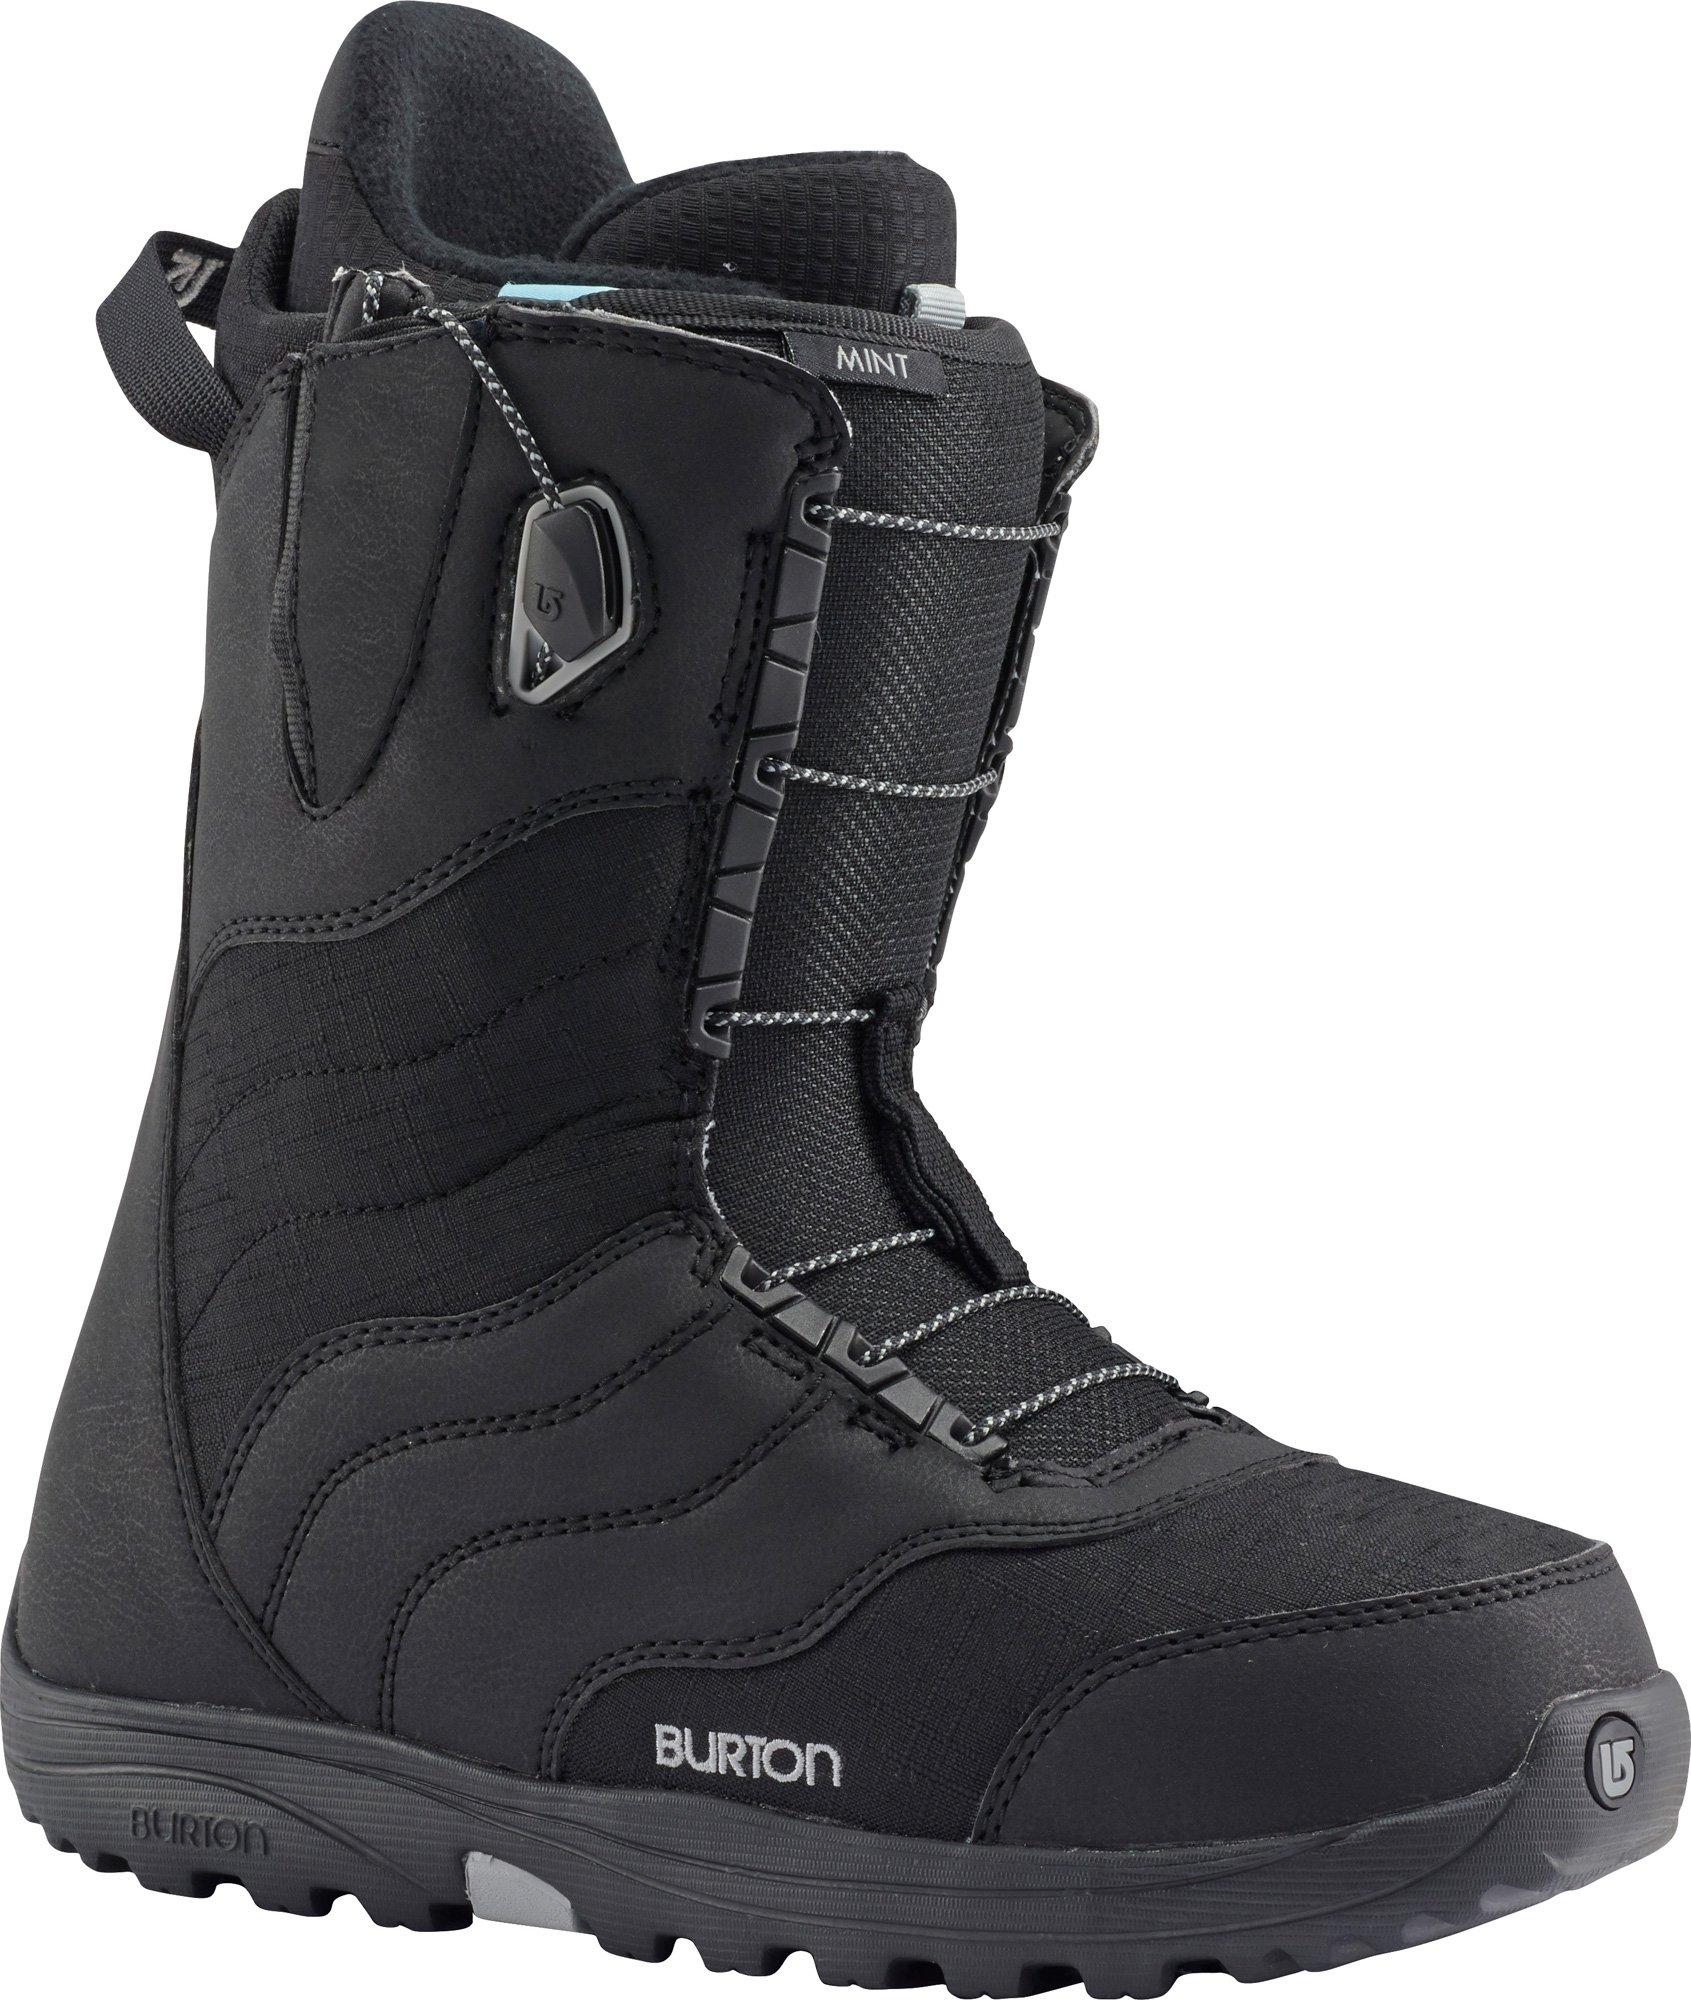 Burton Mint Snowboard Boot 2016 - Womens Black 5 by Burton